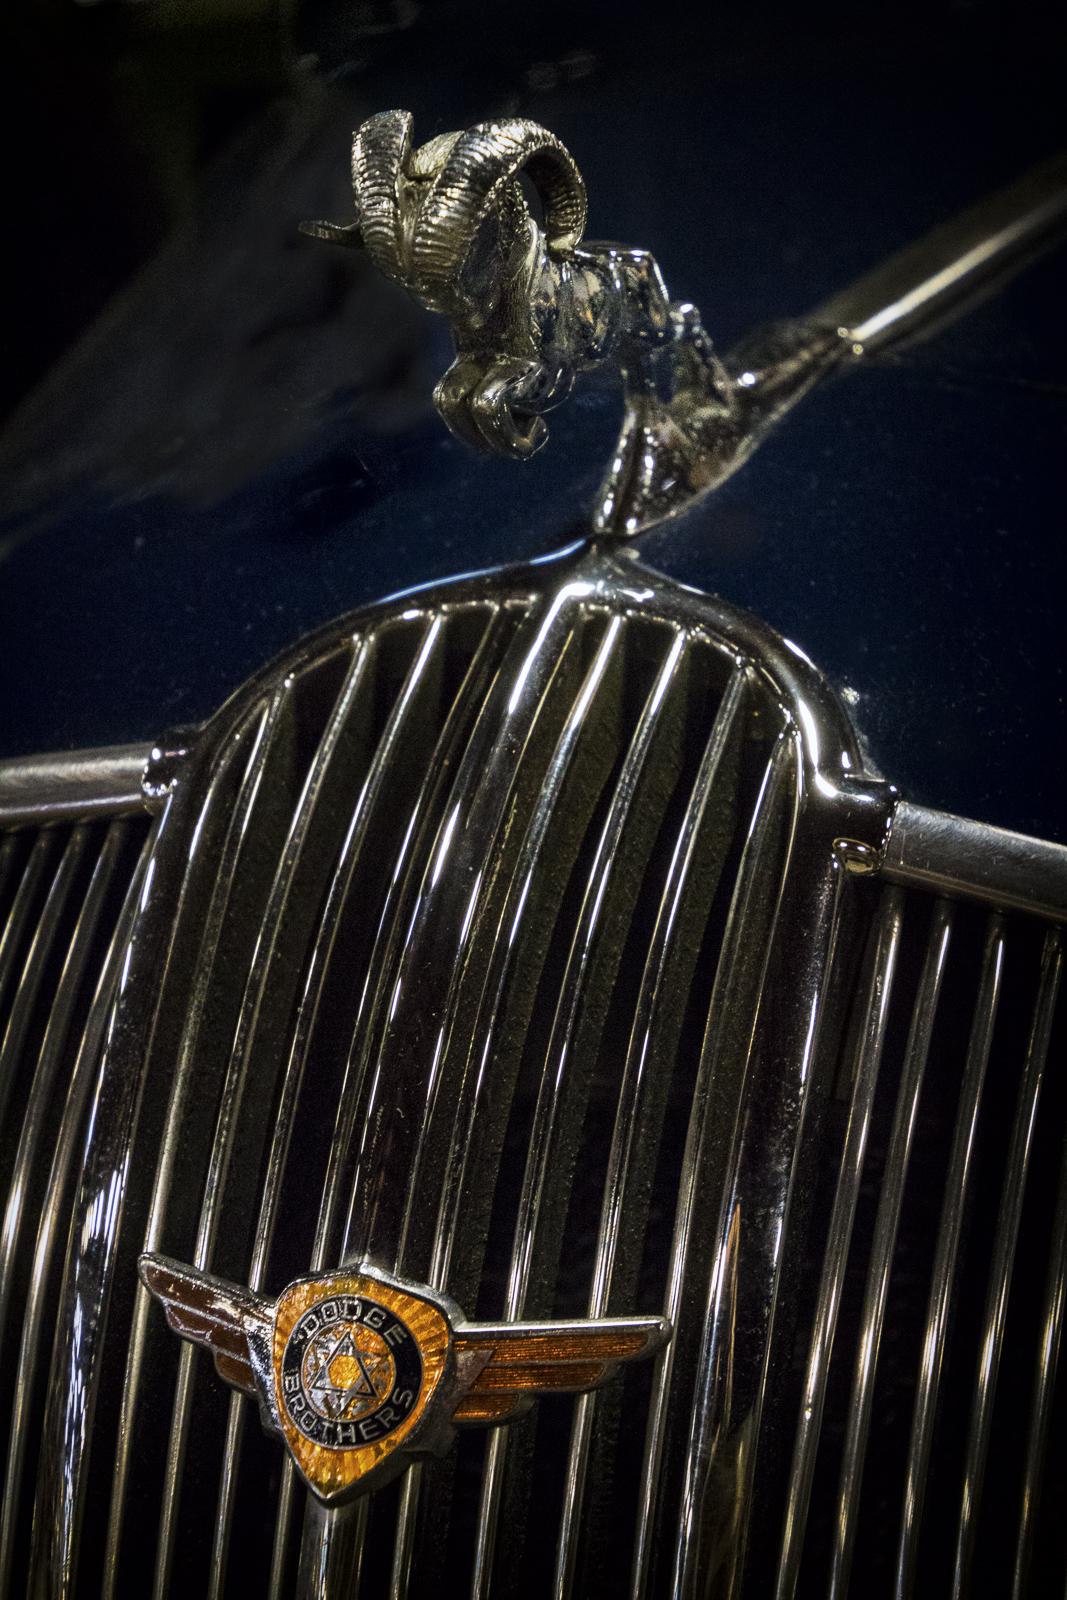 1936 Dodge Truck California Automobile Museum – http://www.calautomuseum.org – Sacramento, California, U.S.A. – March 31, 2016